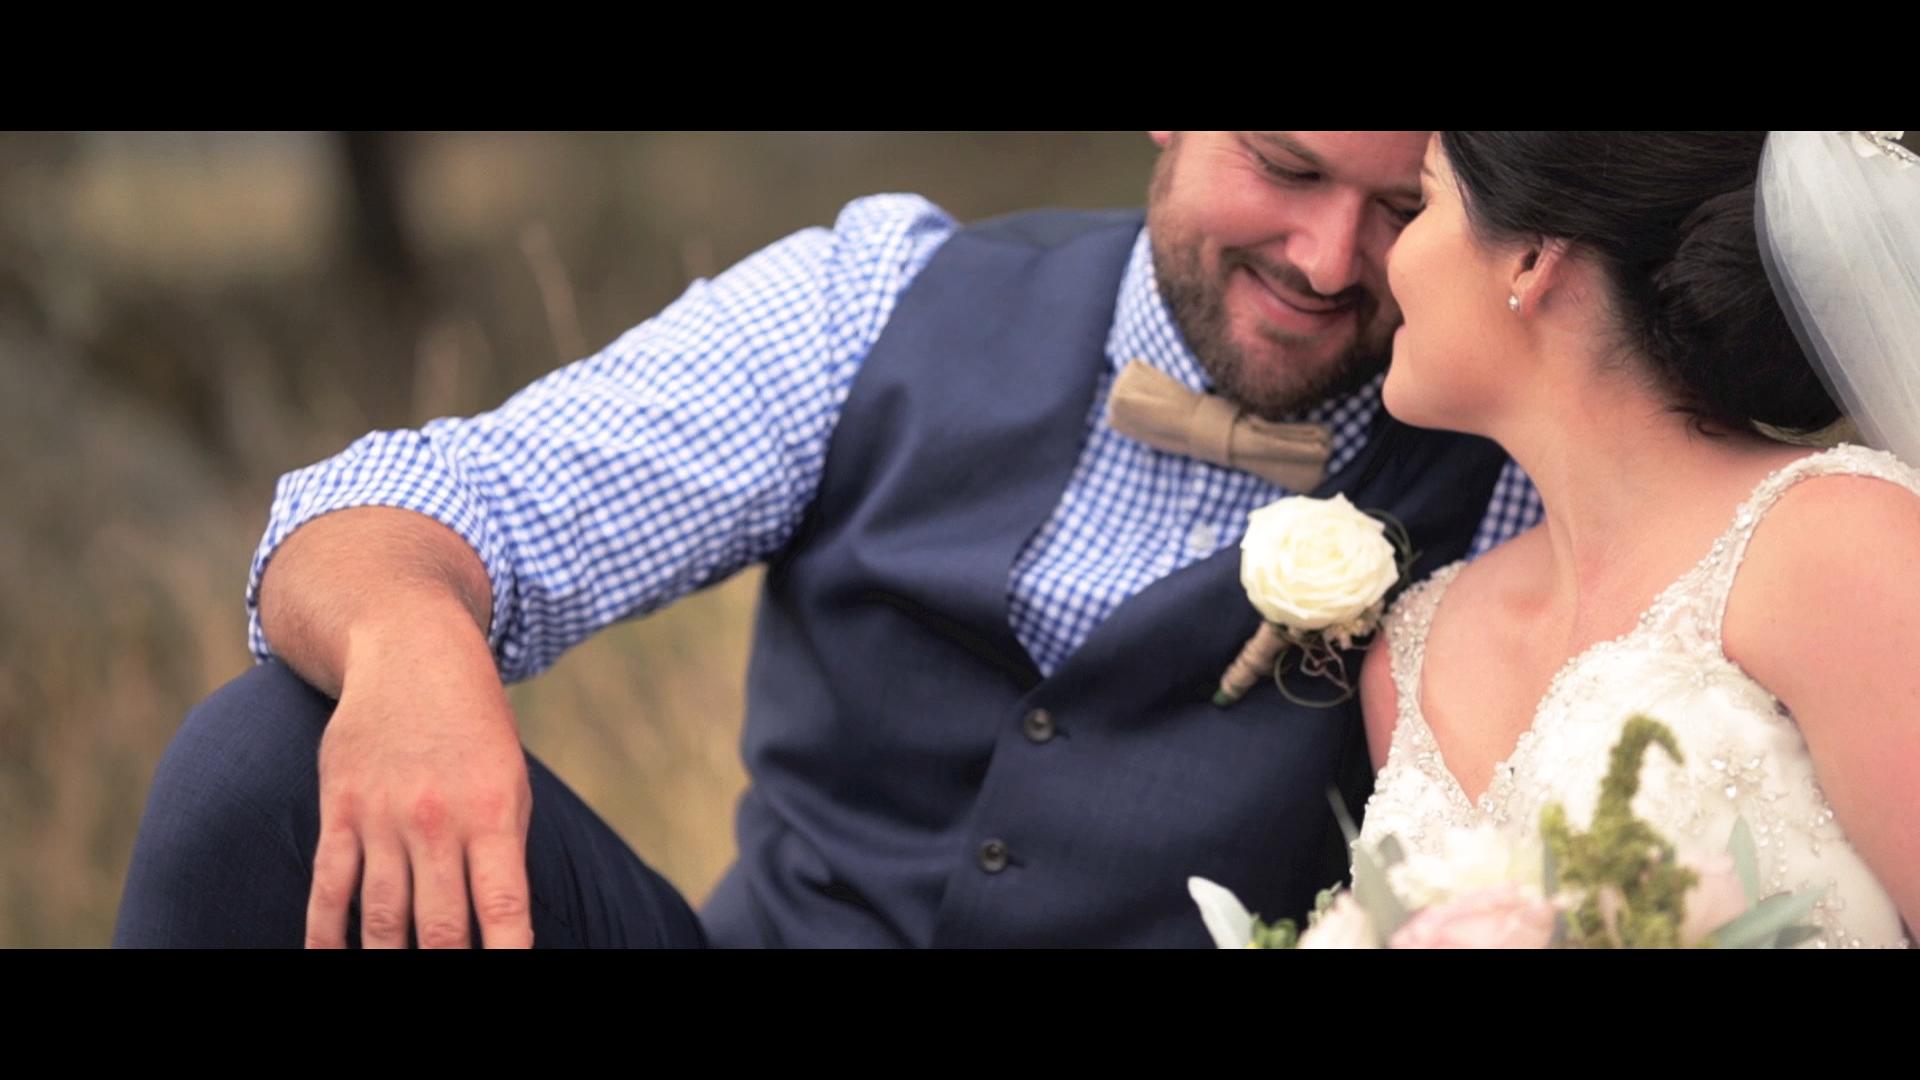 Breanna & Tom - Lake Crackenback Resort & Spa { short story }